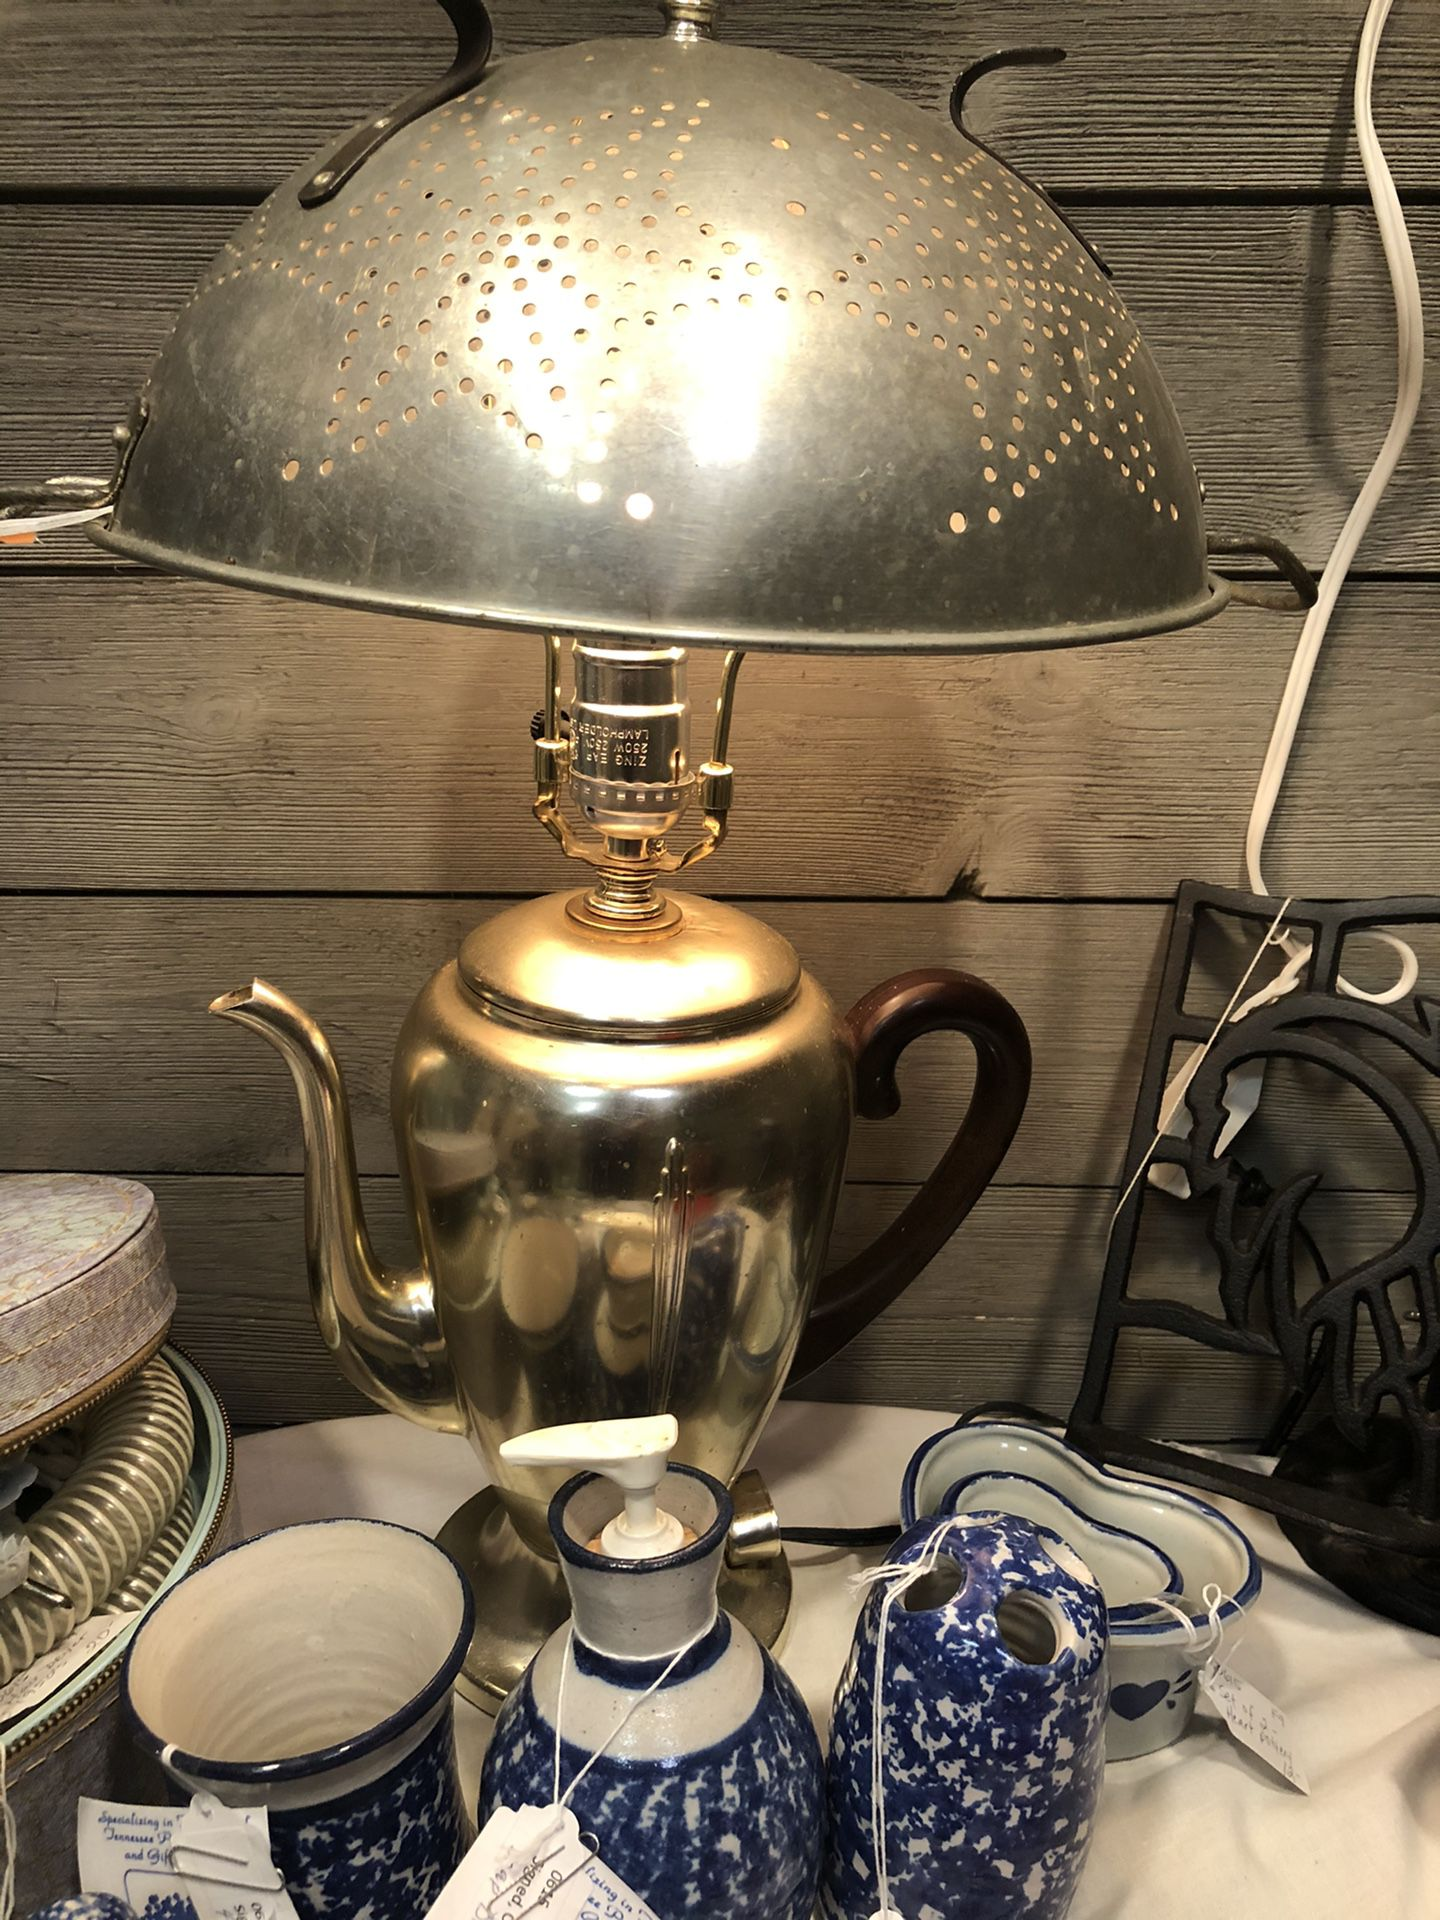 Farmhouse Style Vintage Colander/Percolator Lamp